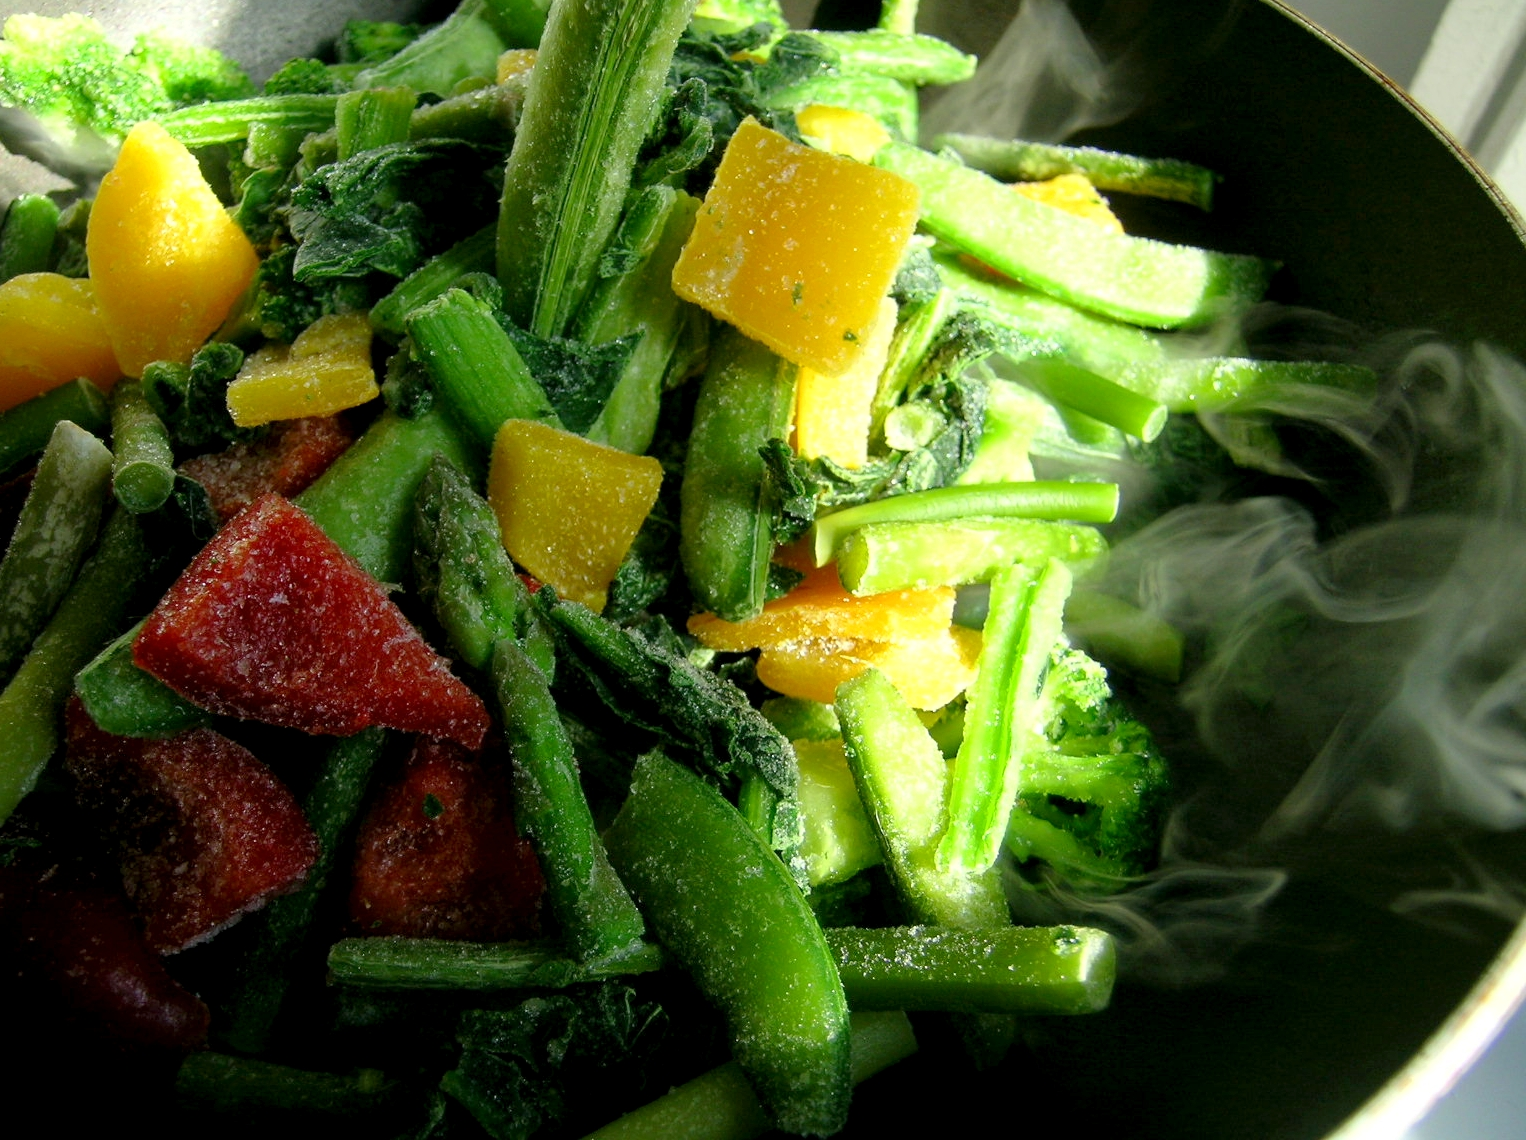 Yeast Free Diet Made Simple